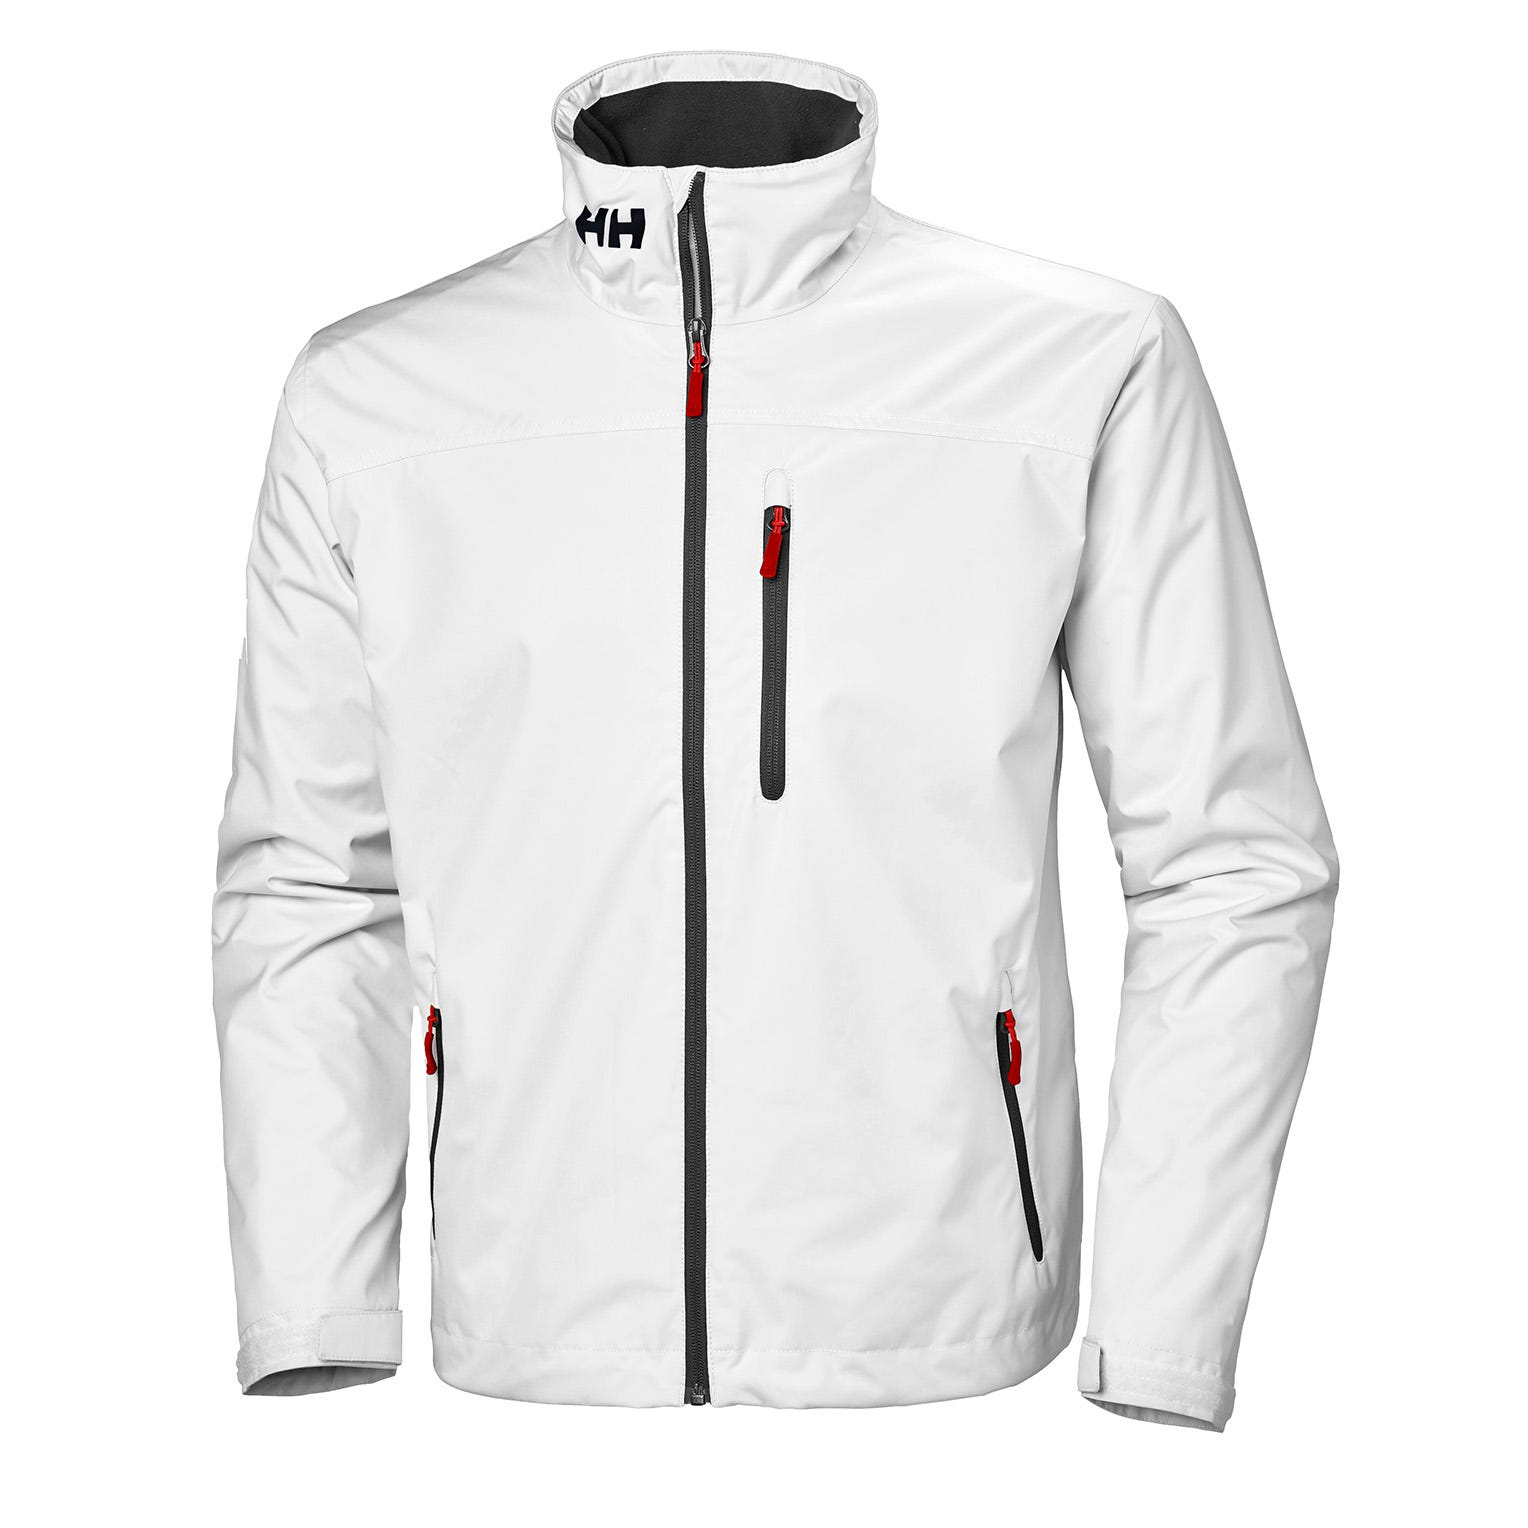 Helly Hansen Mens Sailing Jacket White L